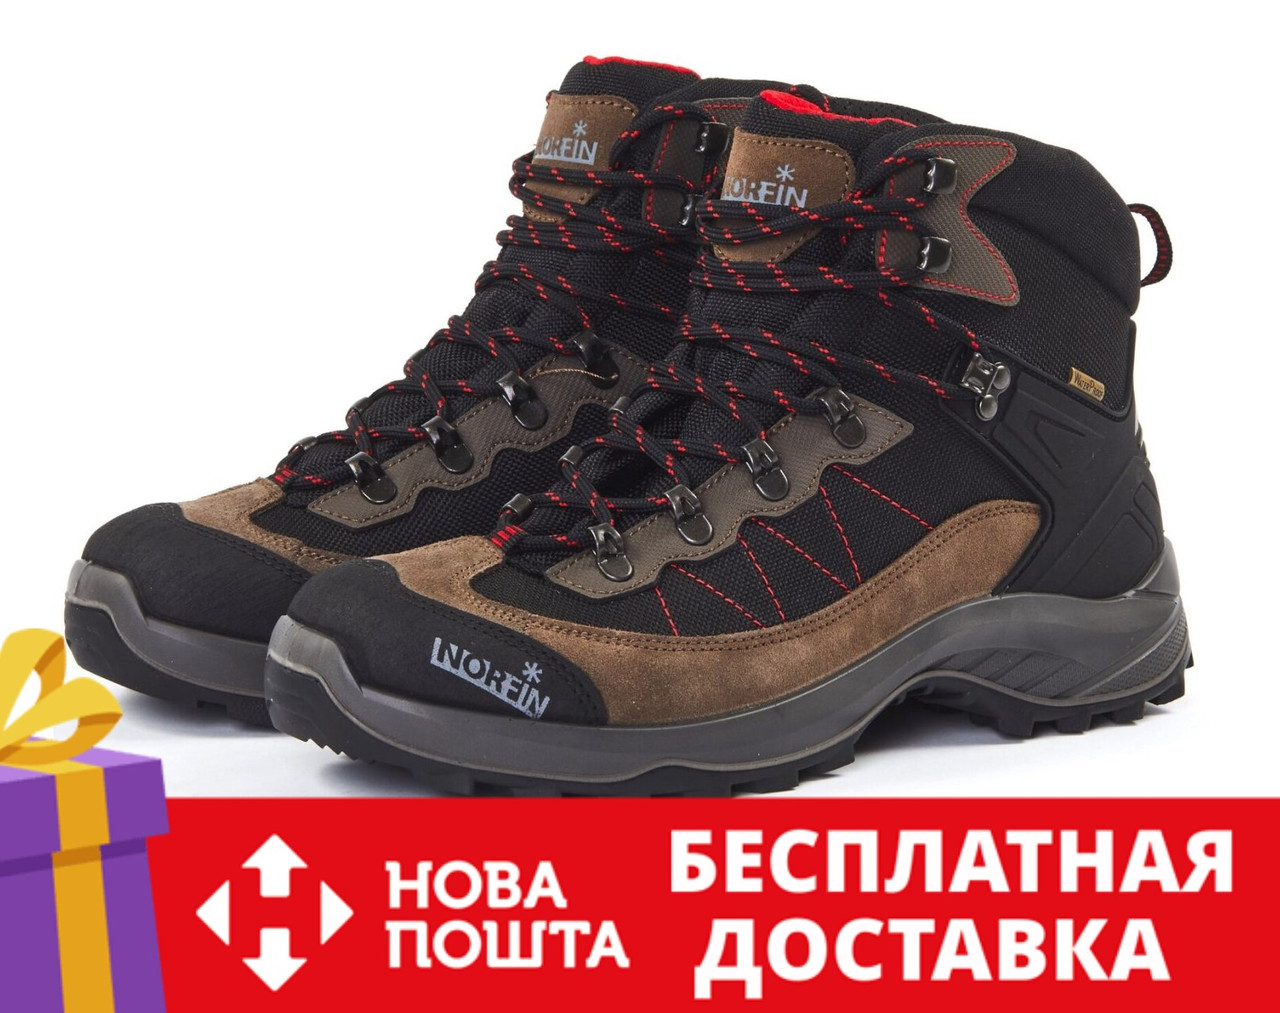 Ботинки трекинговые Norfin Ntx SCOUT